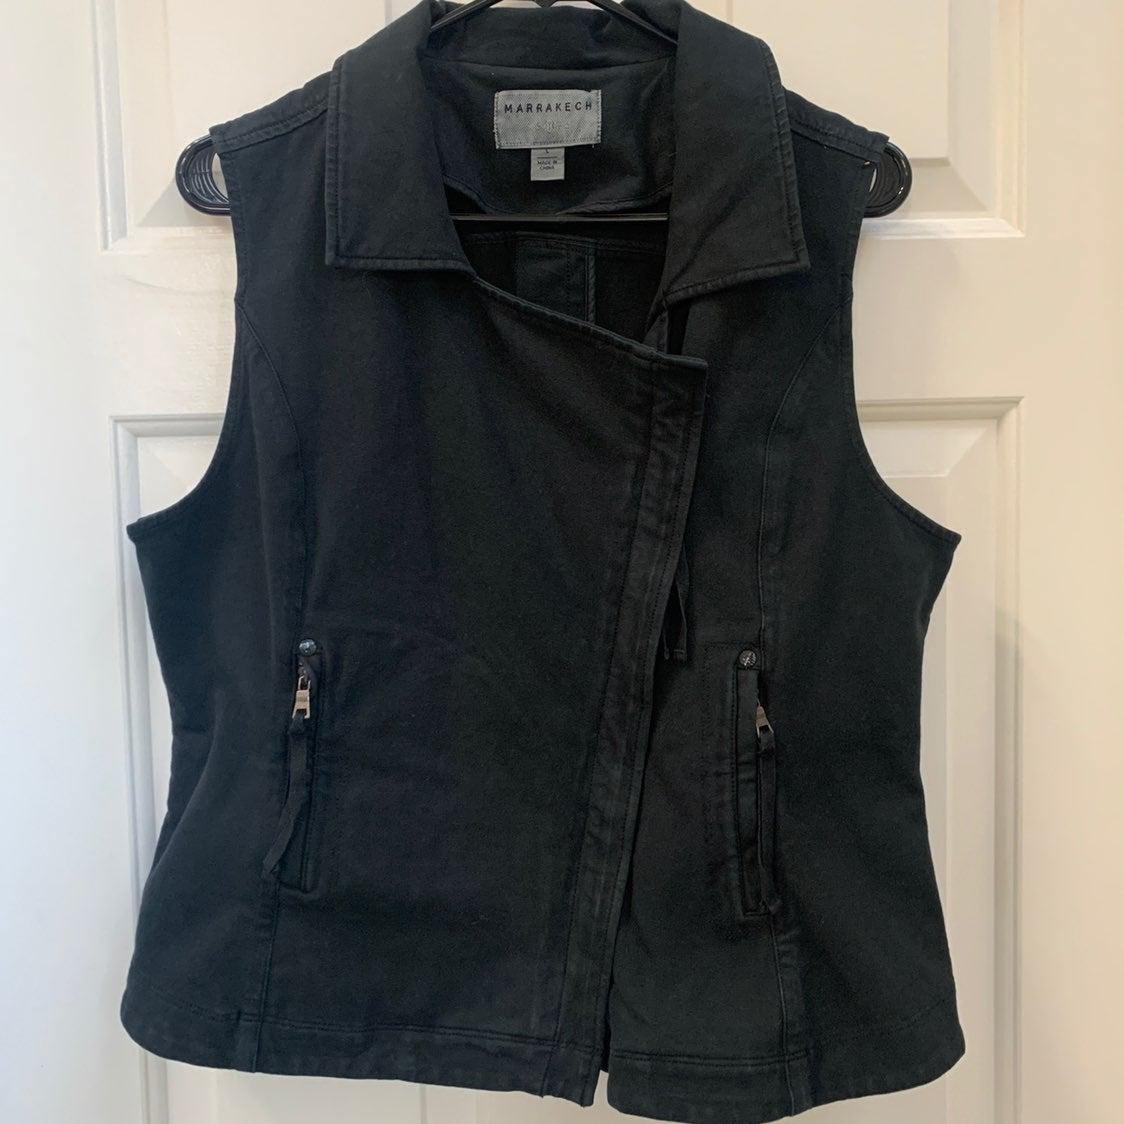 Marrakech Scarlet Black Knit Moto Jacket